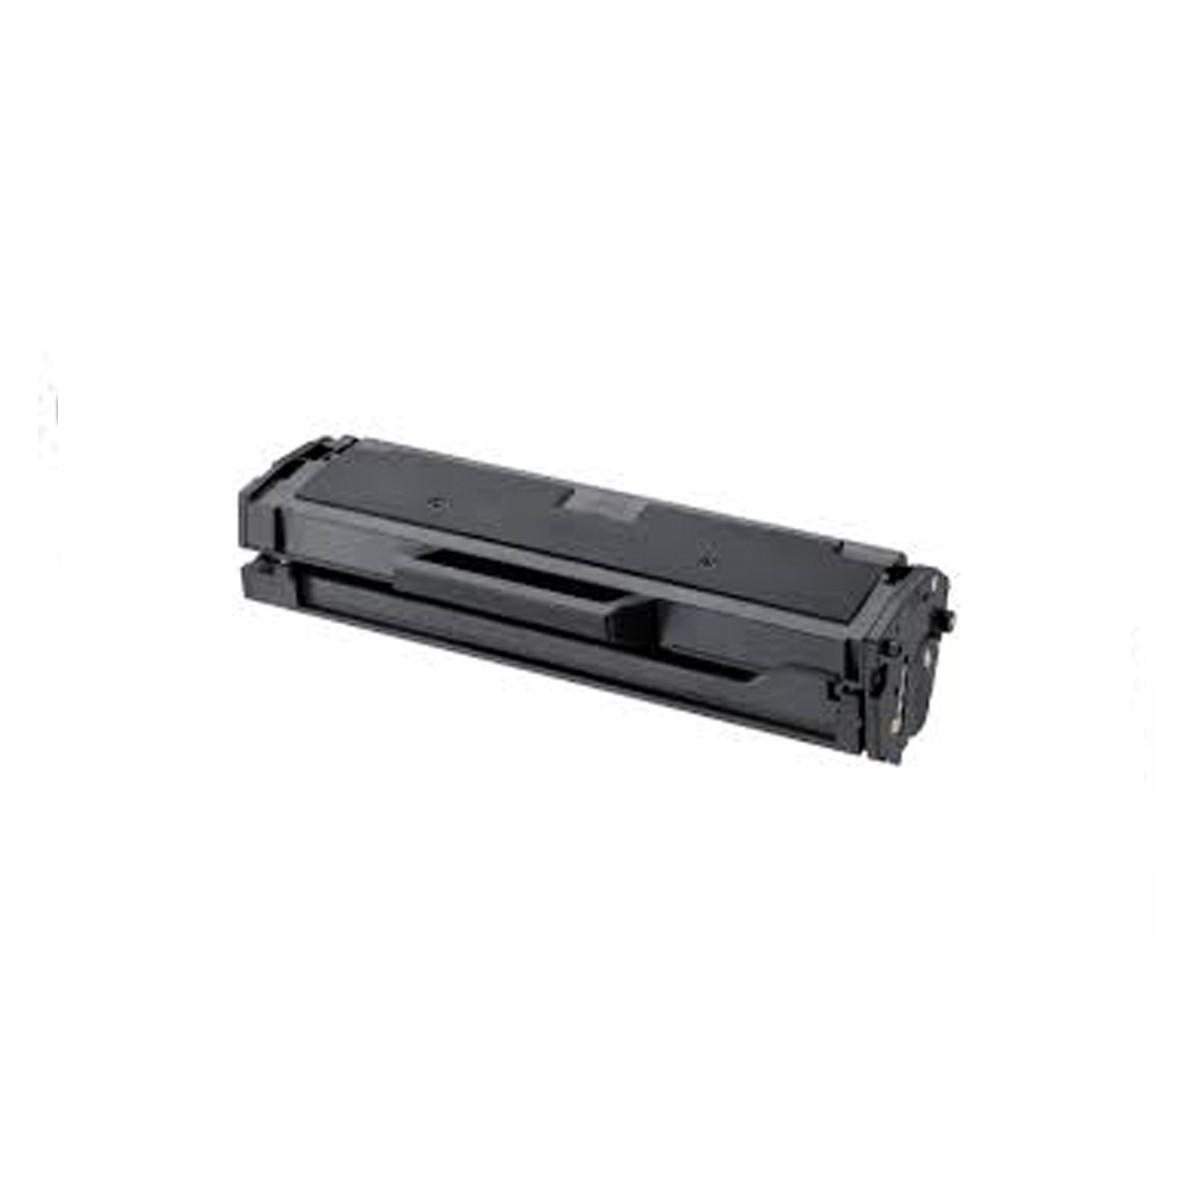 Toner Samsung D111S D111 111 - M2020 M2070 Compativel ZK-2I20-8WHW